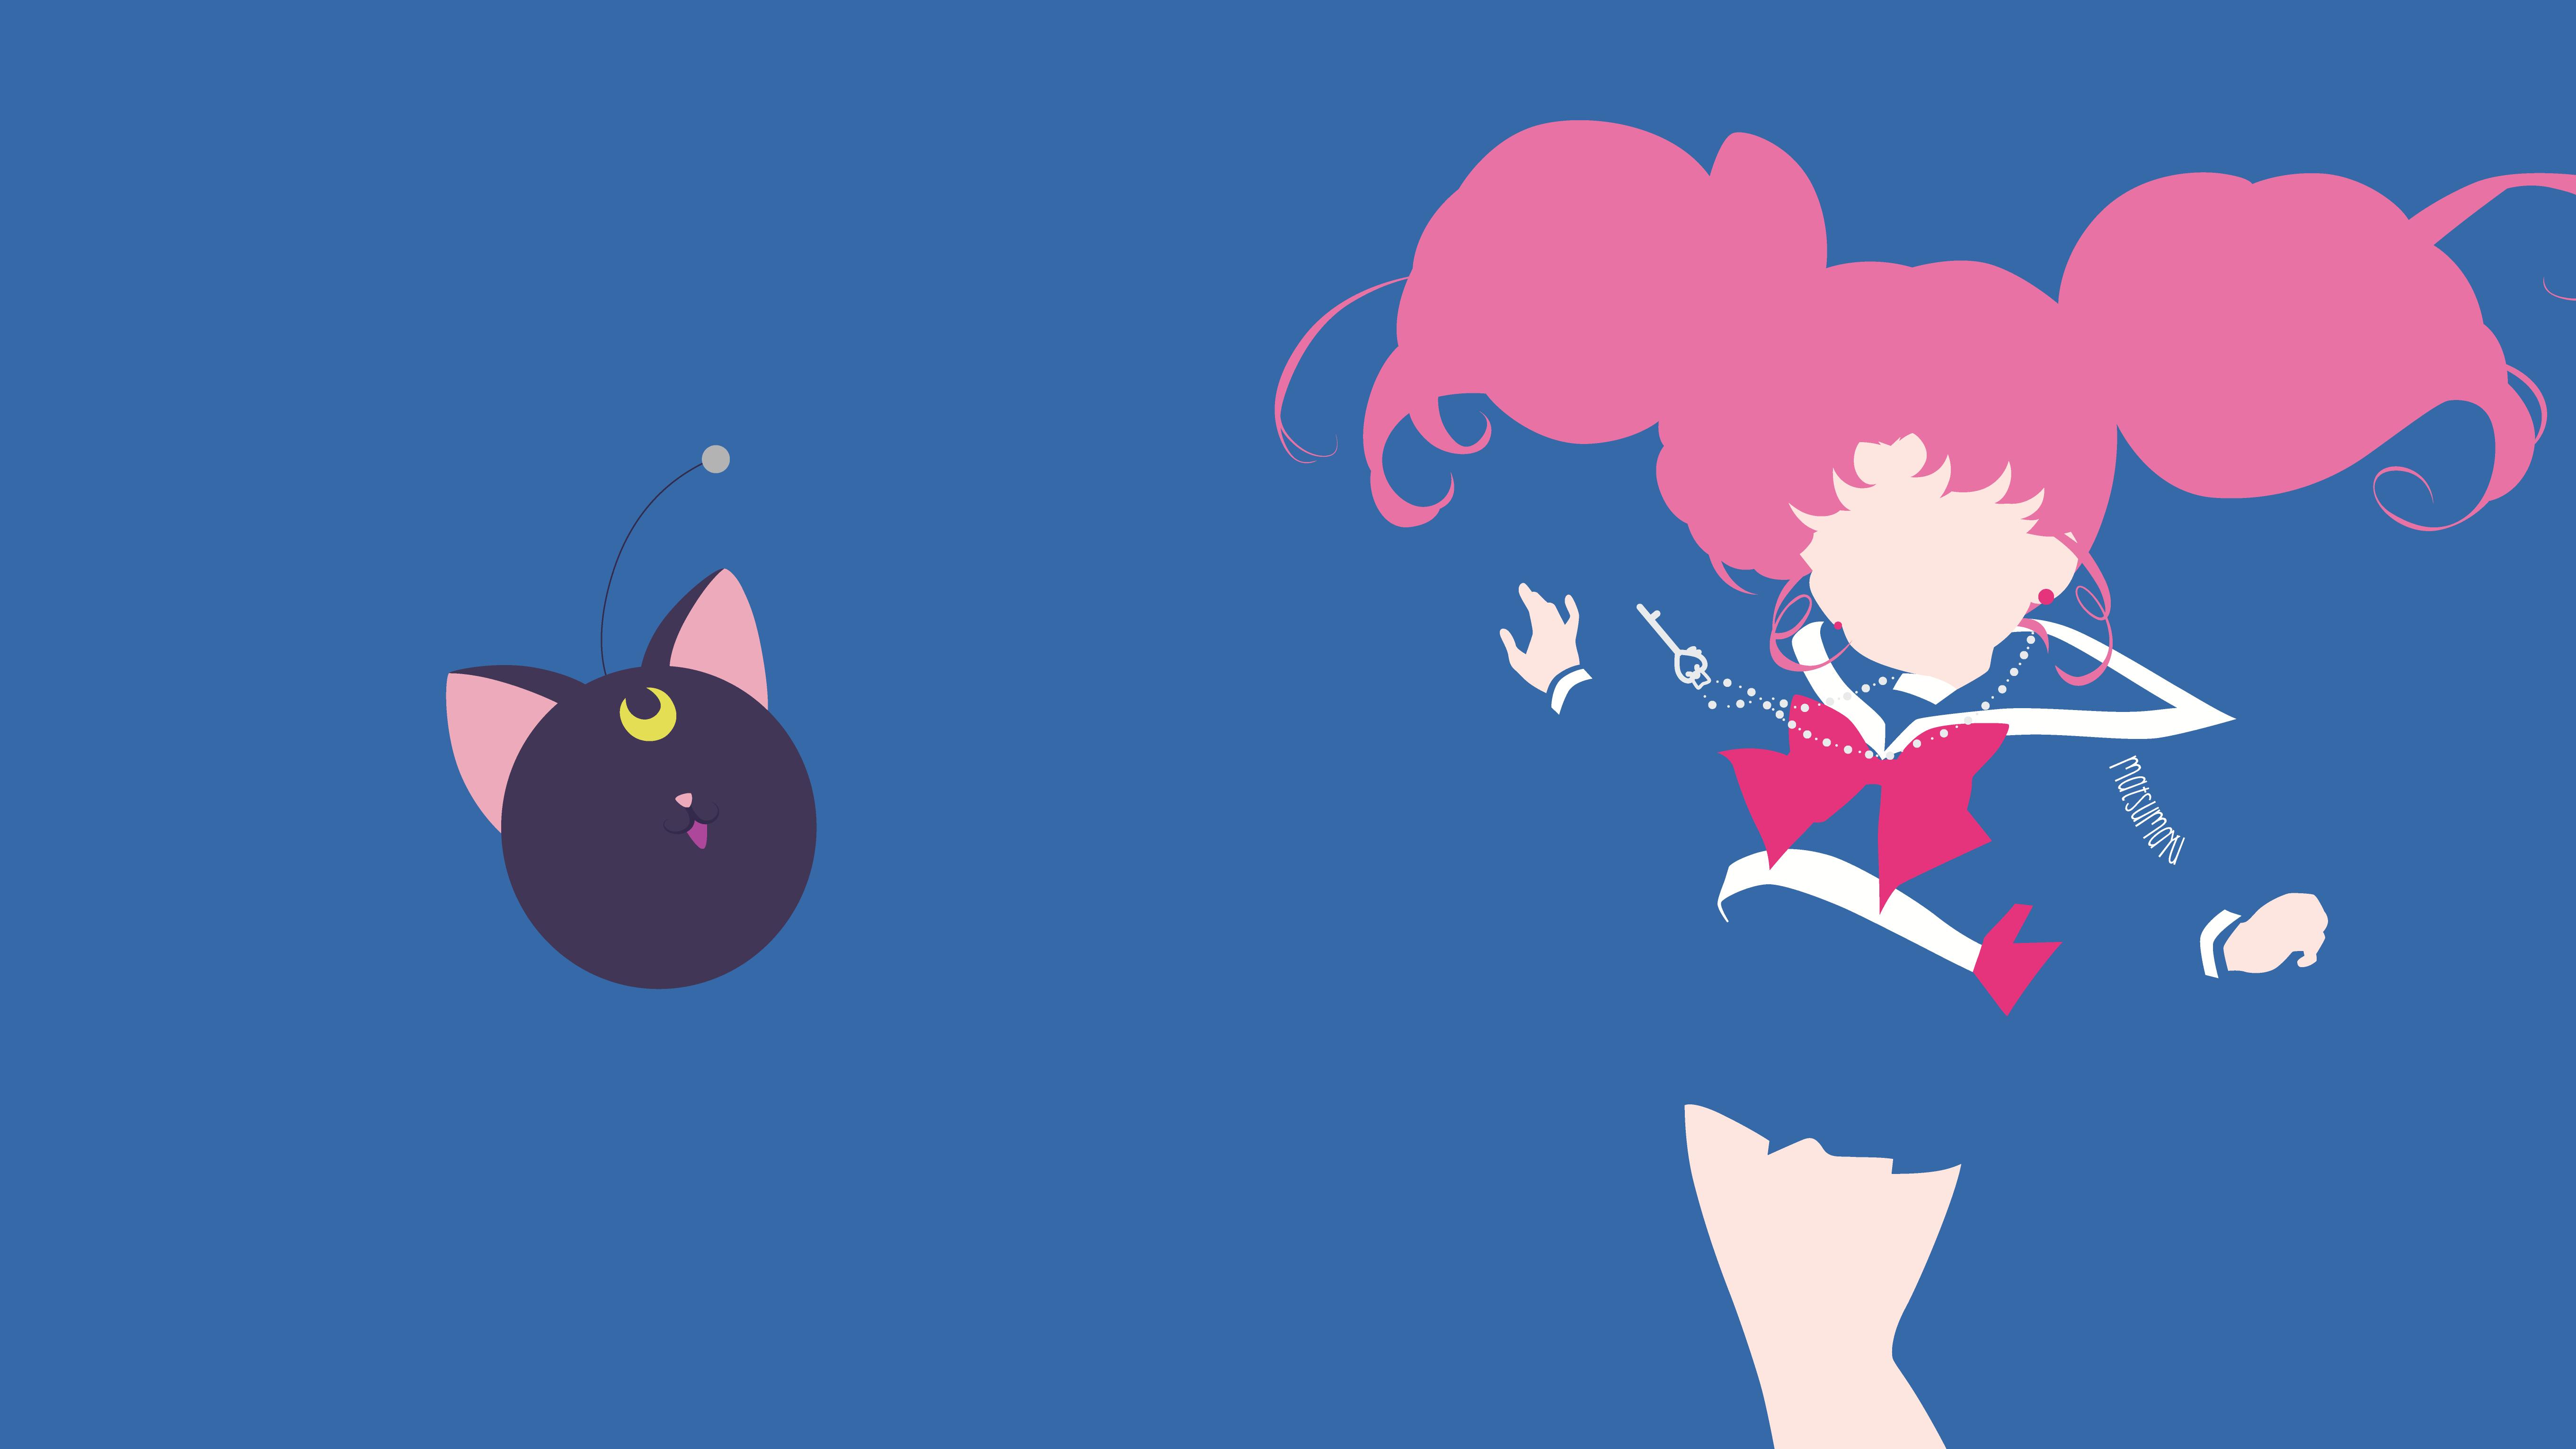 Chibi Usa From Sailor Moon Crystal Minimalist By Matsumayu D9bh9am Png 5443 3061 Sailor Moon Crystal Sailor Moon Wallpaper Sailor Chibi Moon